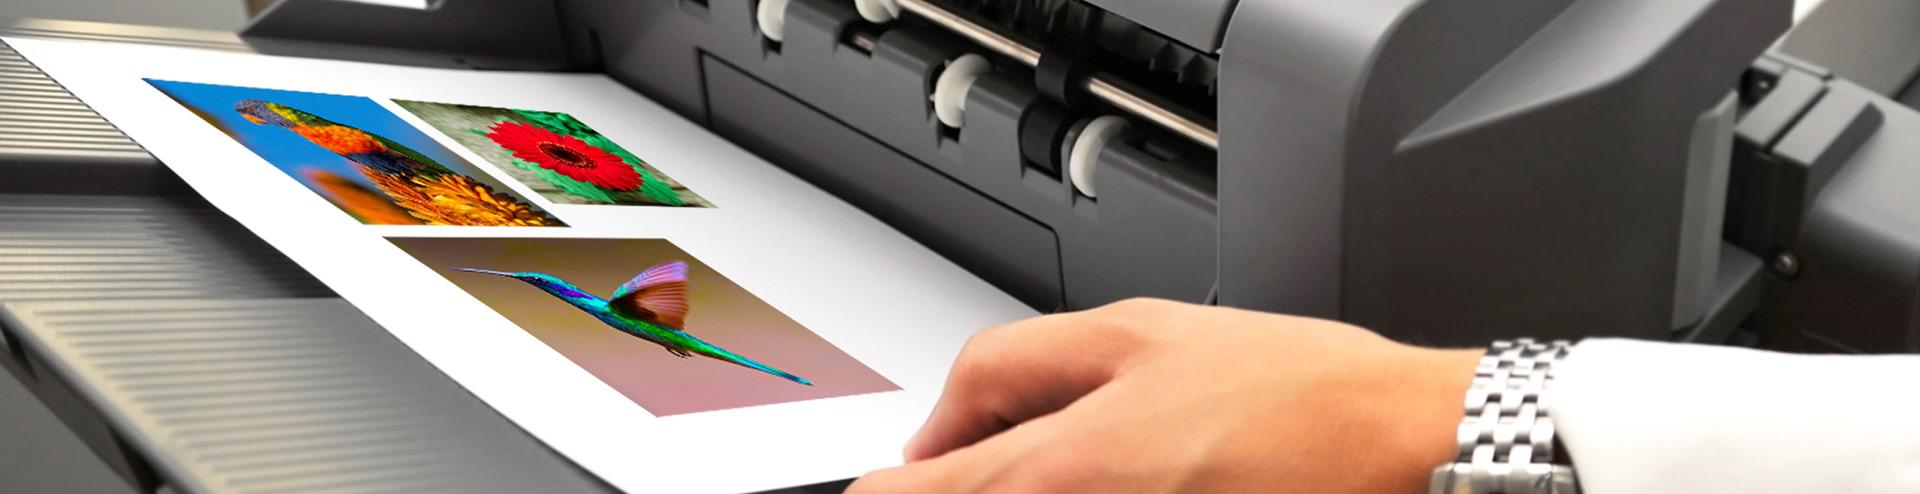 transferfolie, tintenstrahldrucker, laserdrucker